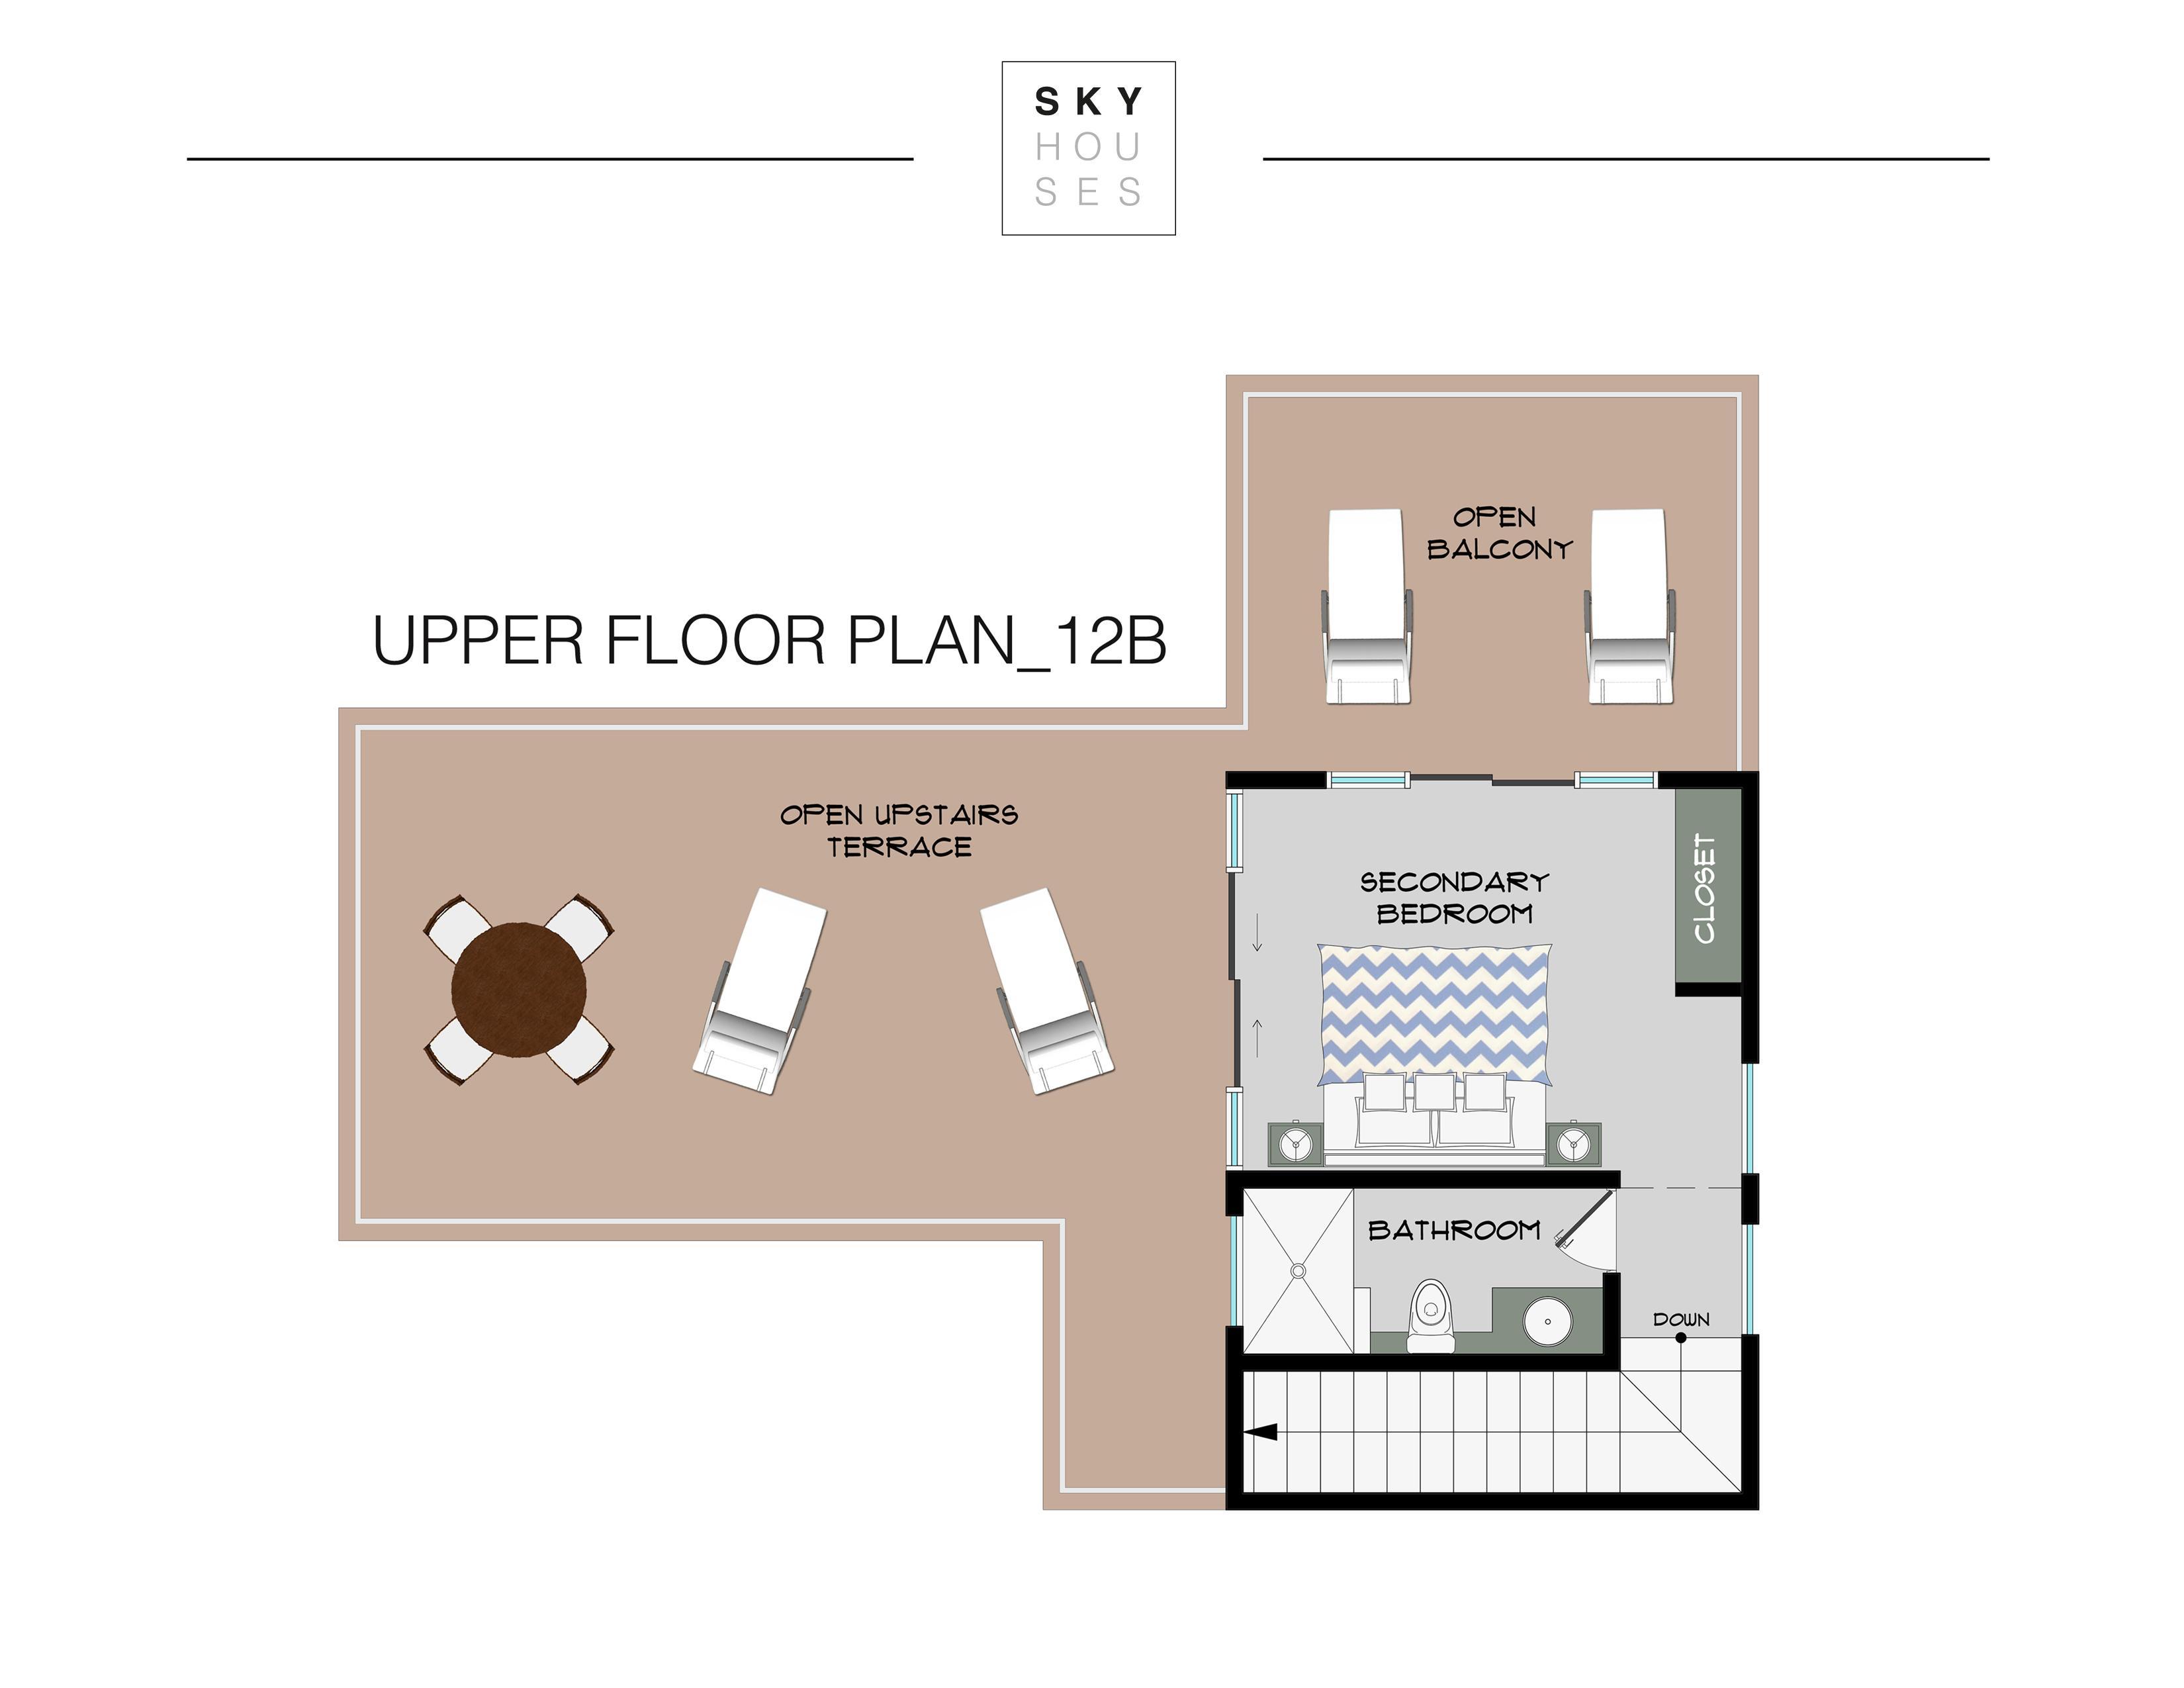 Upper Floor Plan 12b